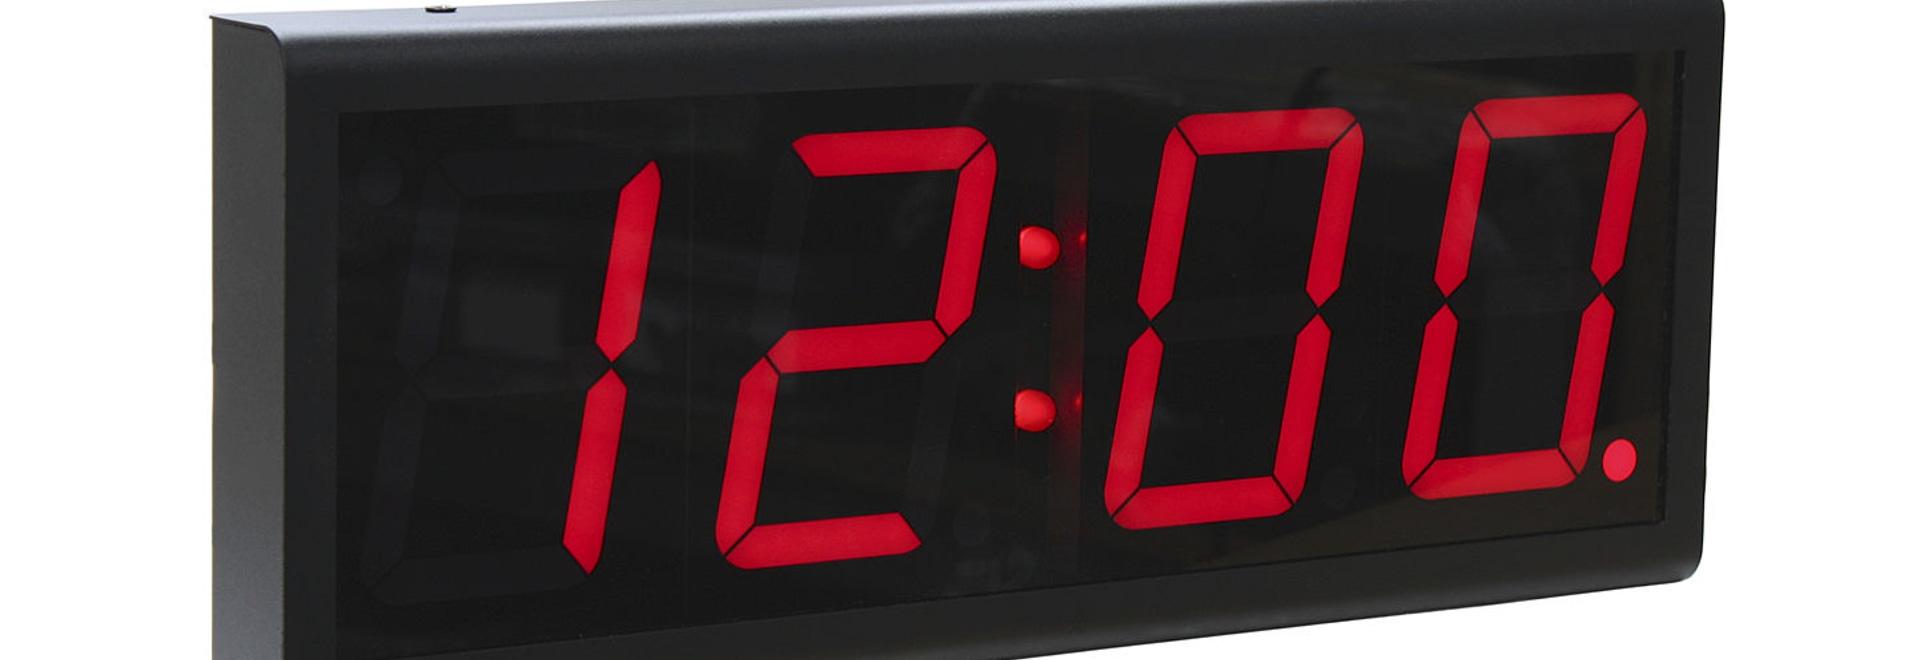 Digital Signal Clock Improves Business Efficiency